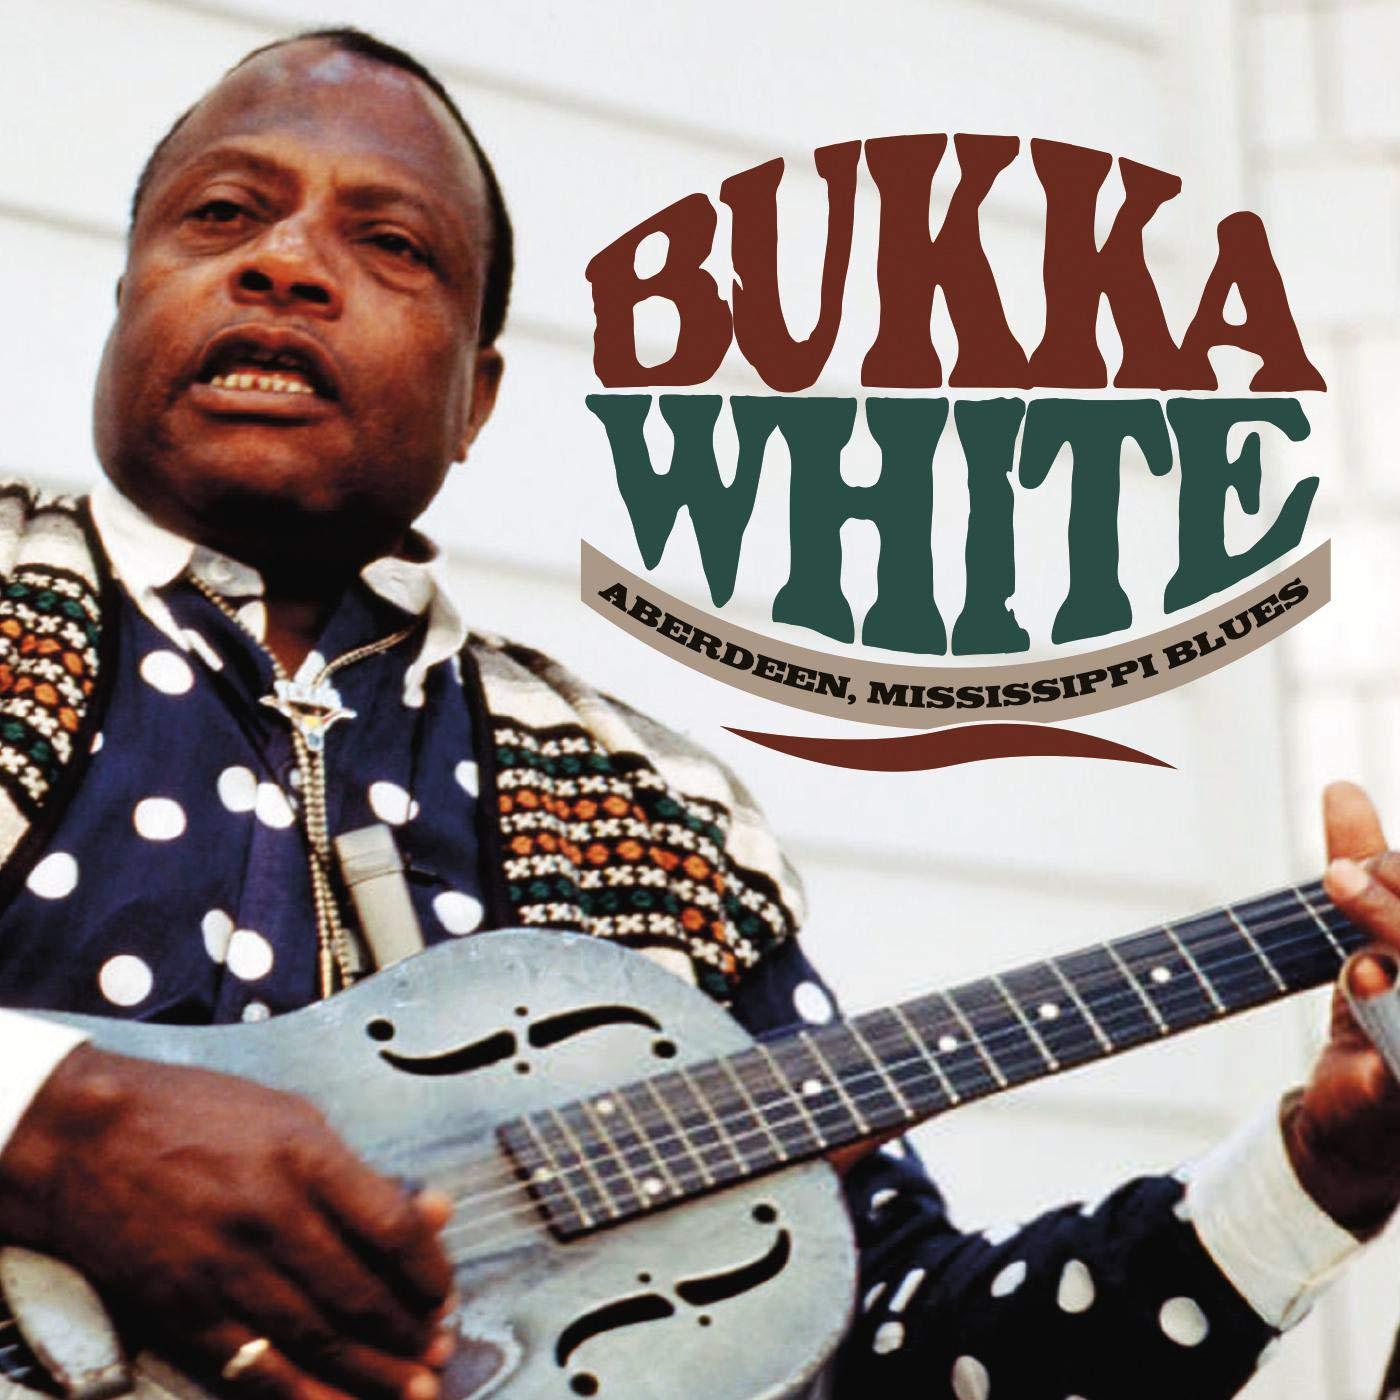 Bukka White - Aberdeen, Mississippi Blues